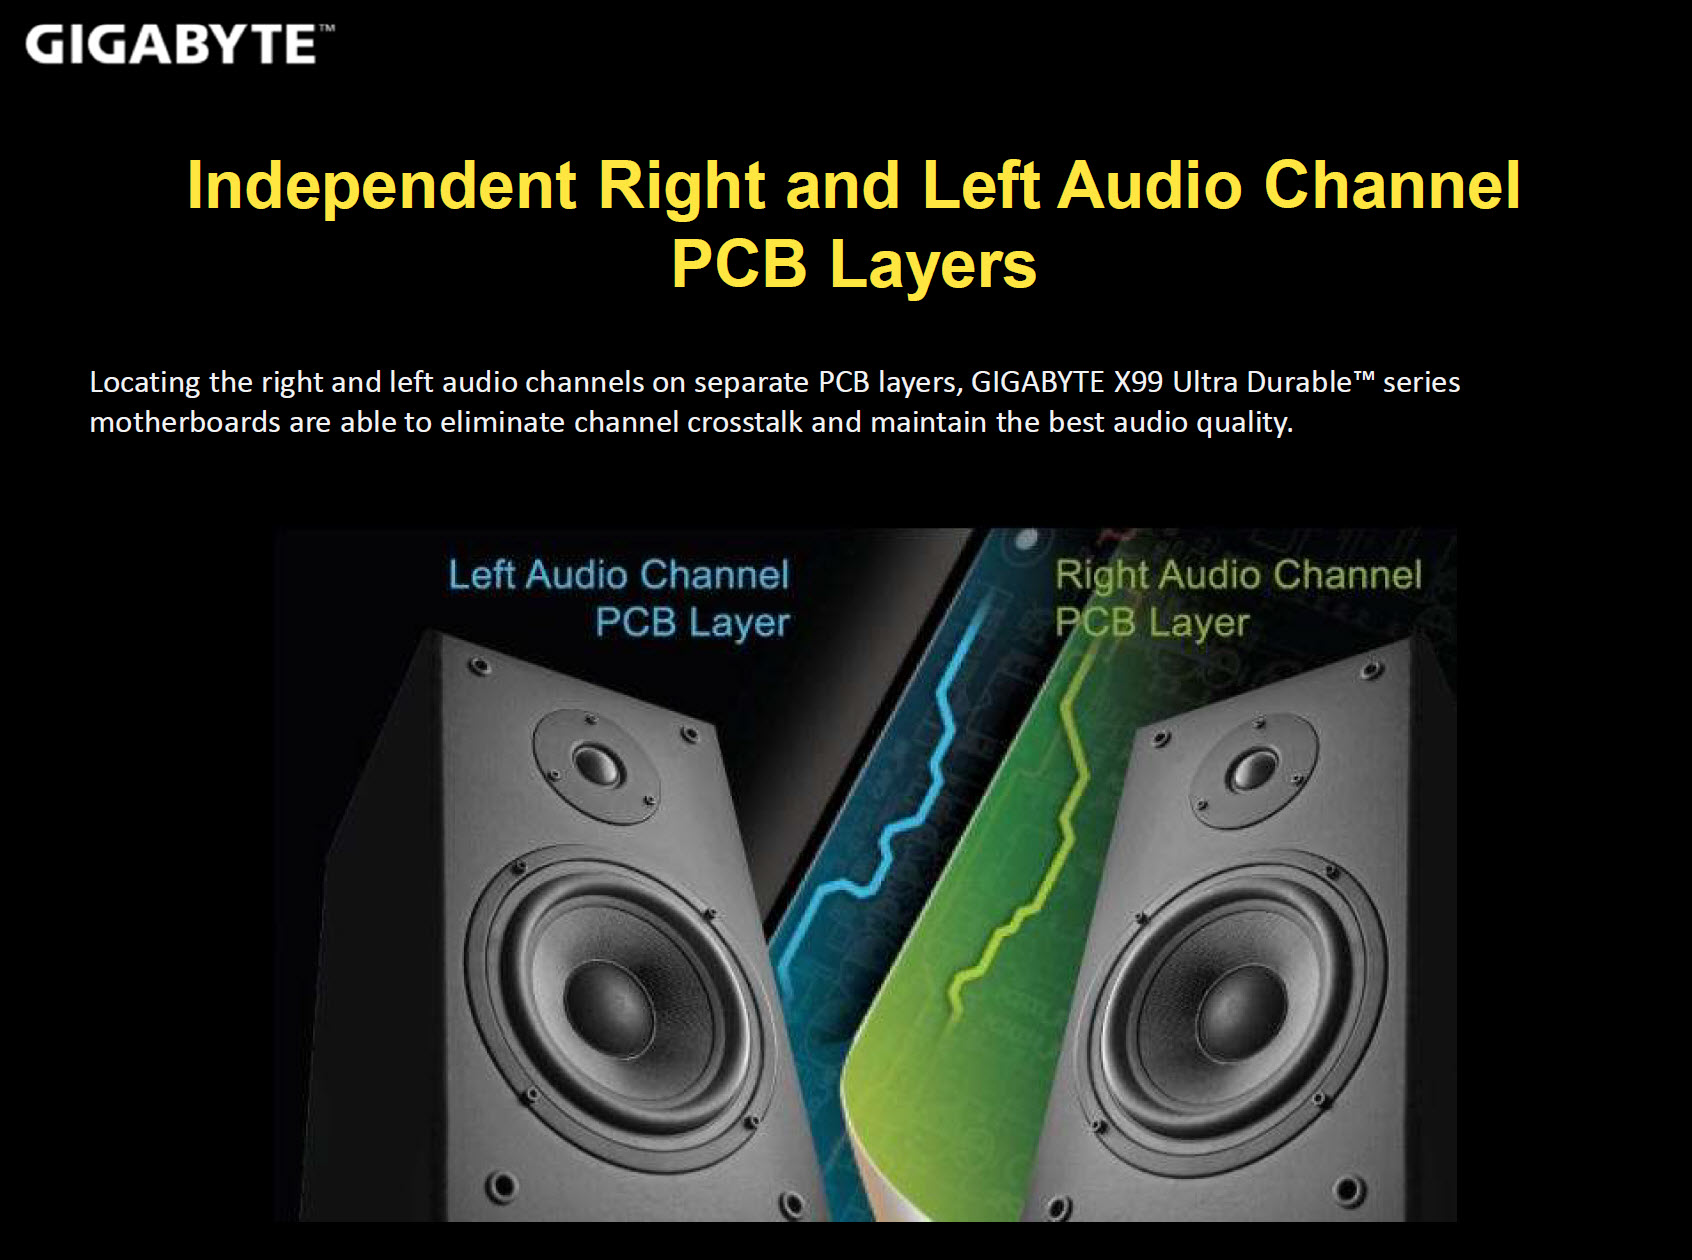 gigabyte-x99-ud7-wifi_pcb-layers